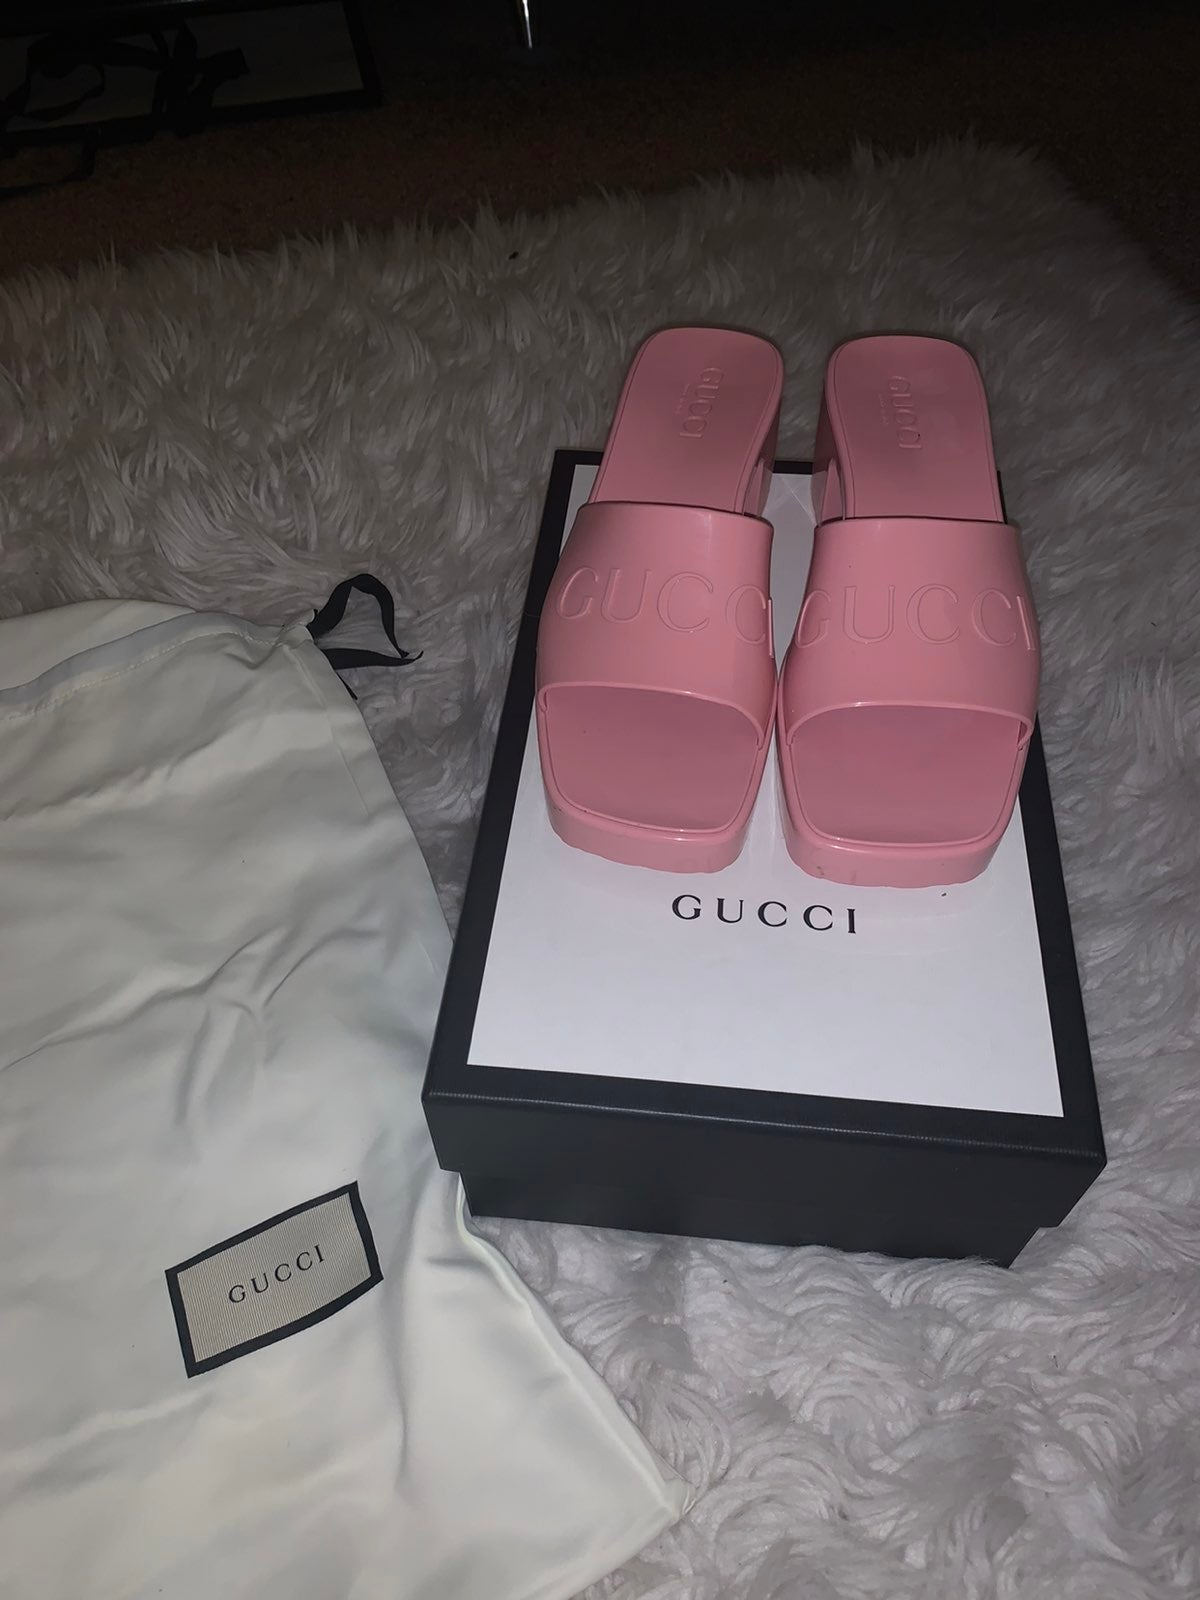 Gucci Women's Rubber Sandal